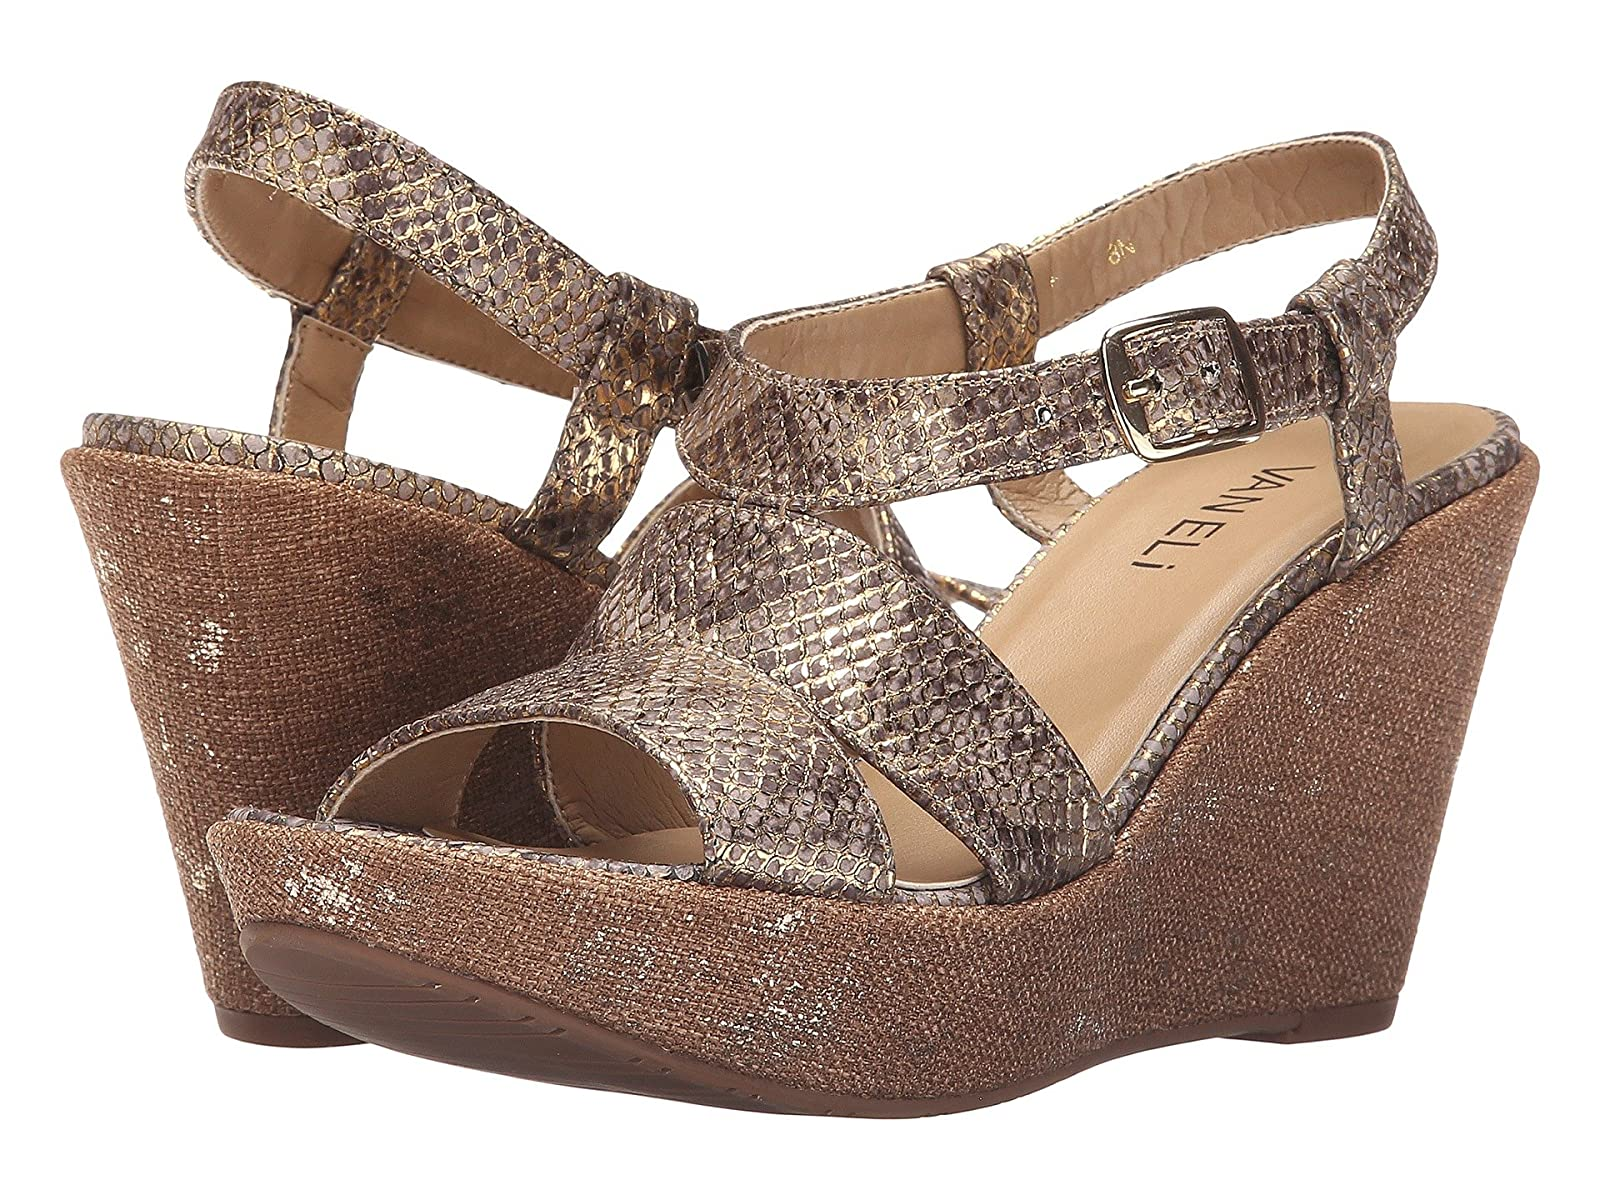 Vaneli ElianaCheap and distinctive eye-catching shoes